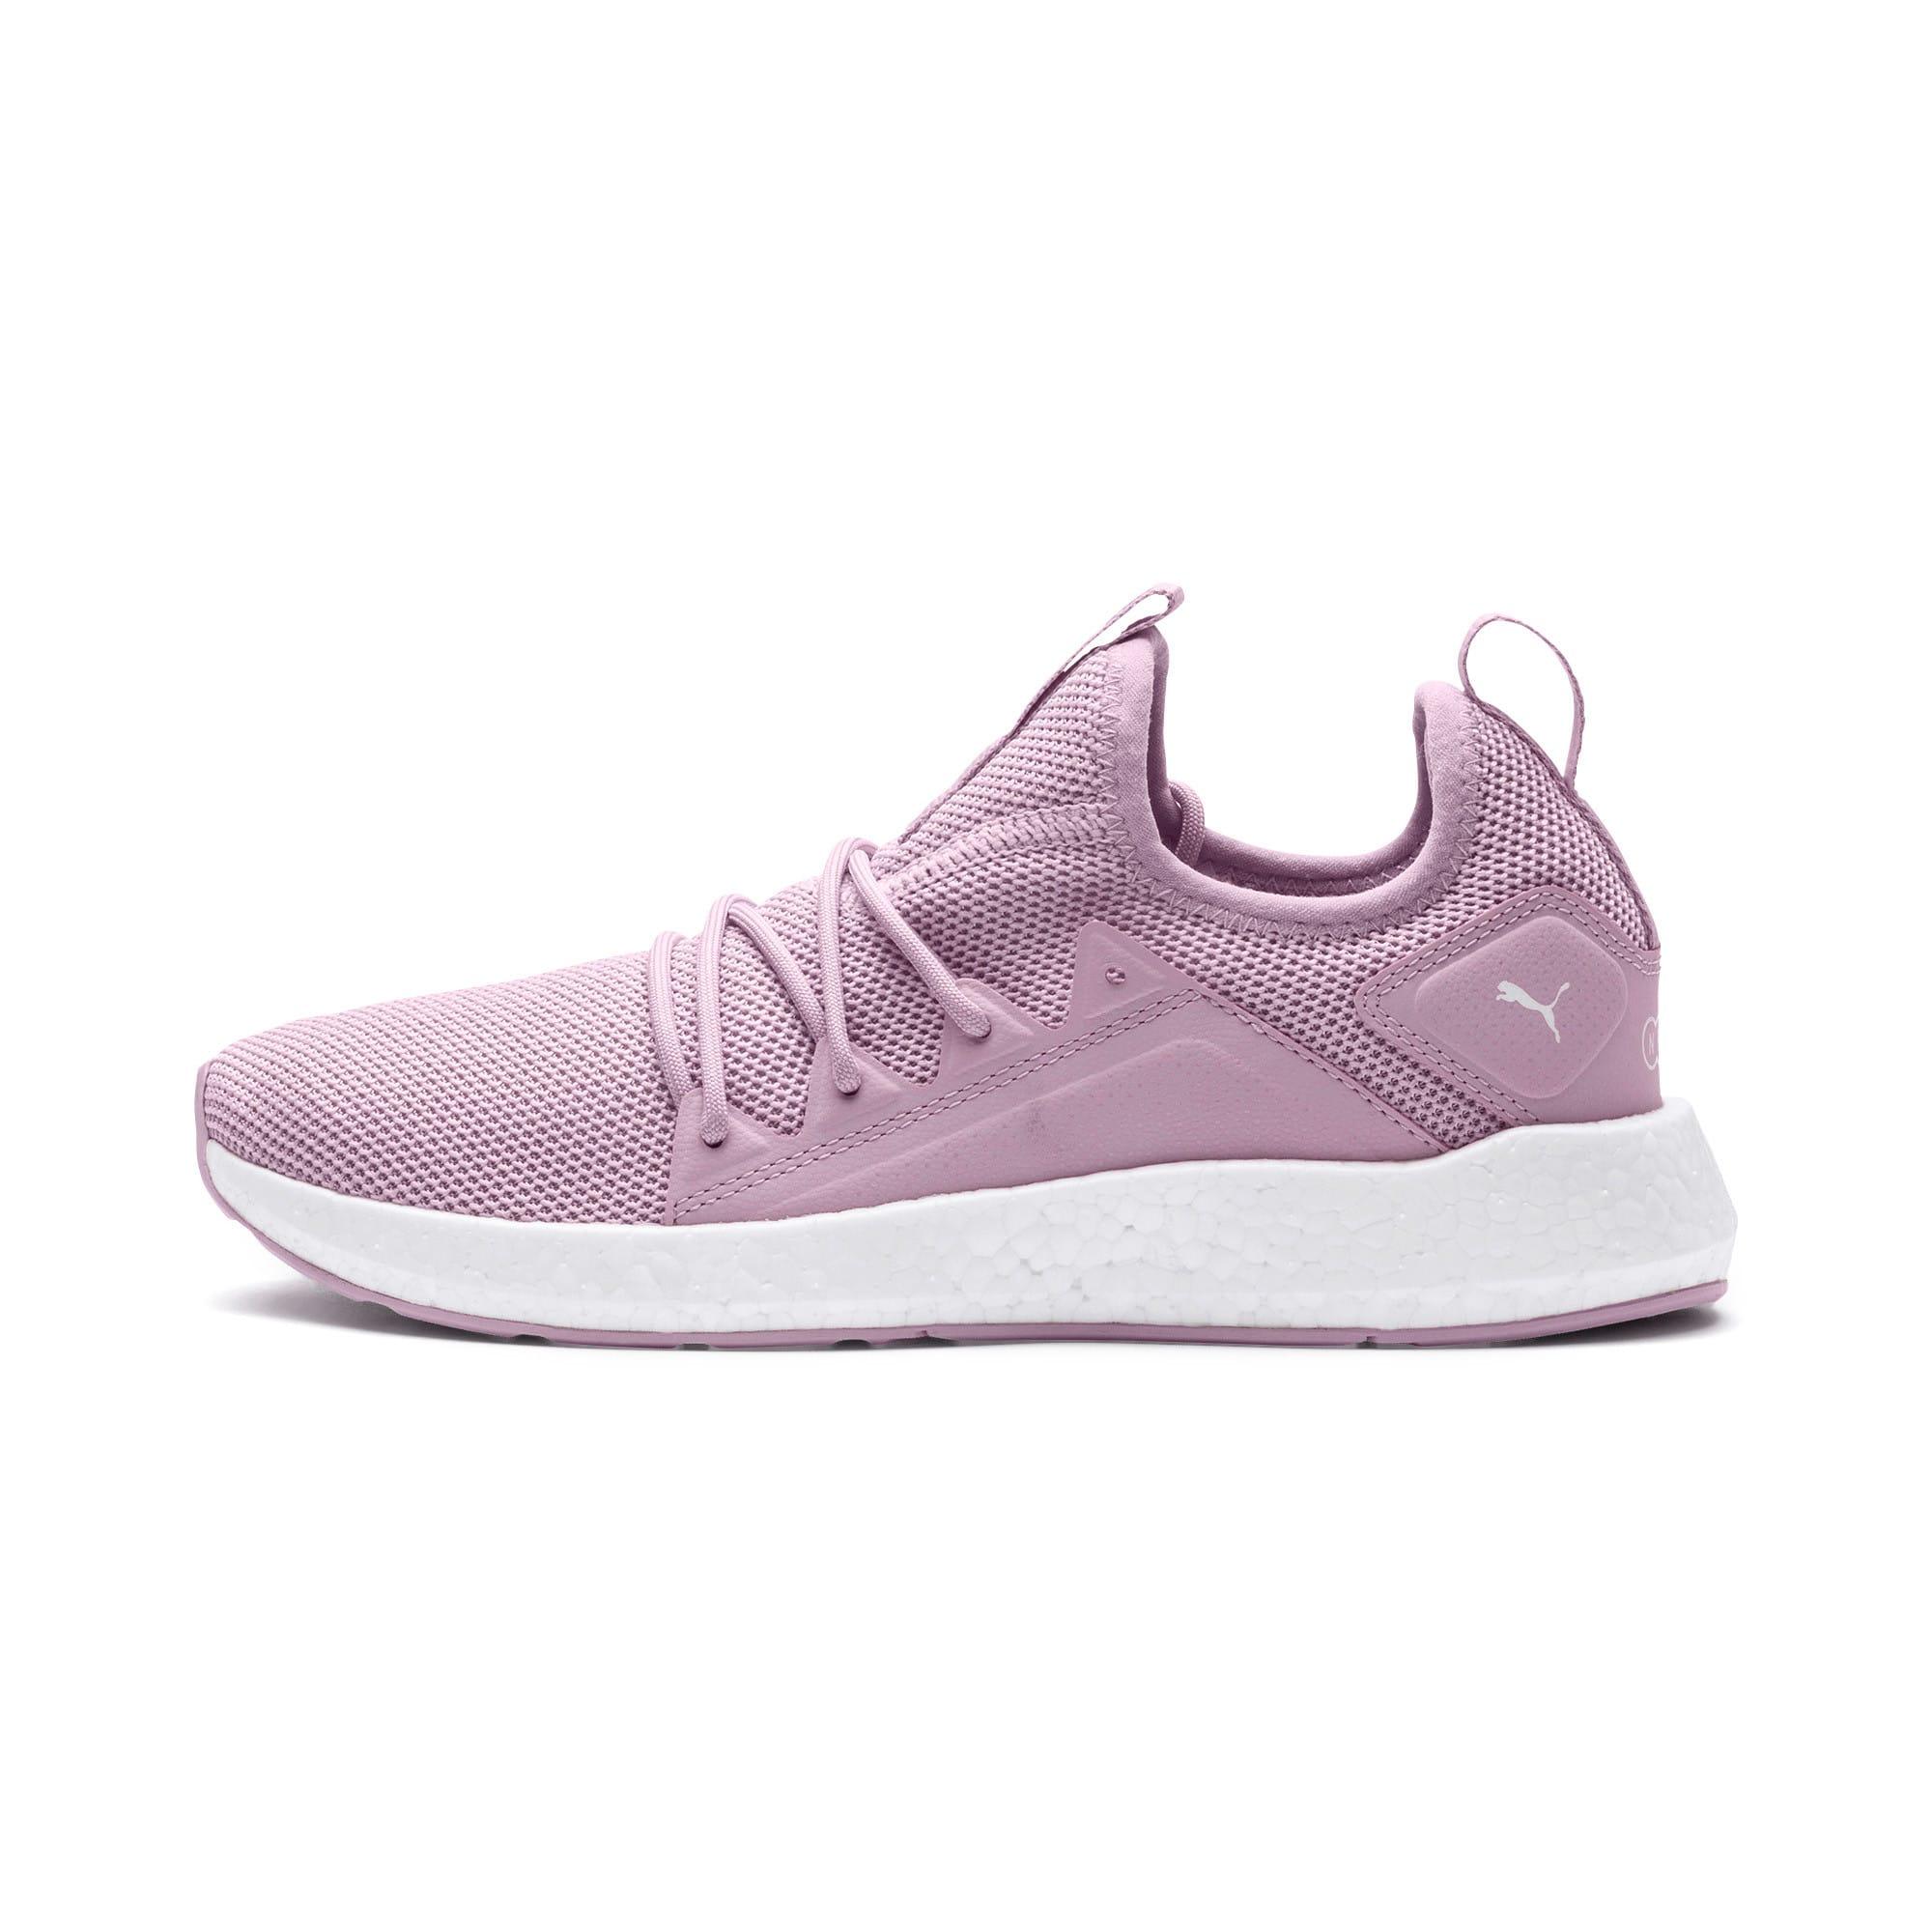 Thumbnail 1 of NRGY Neko Women's Running Shoes, Winsome Orchid-Puma White, medium